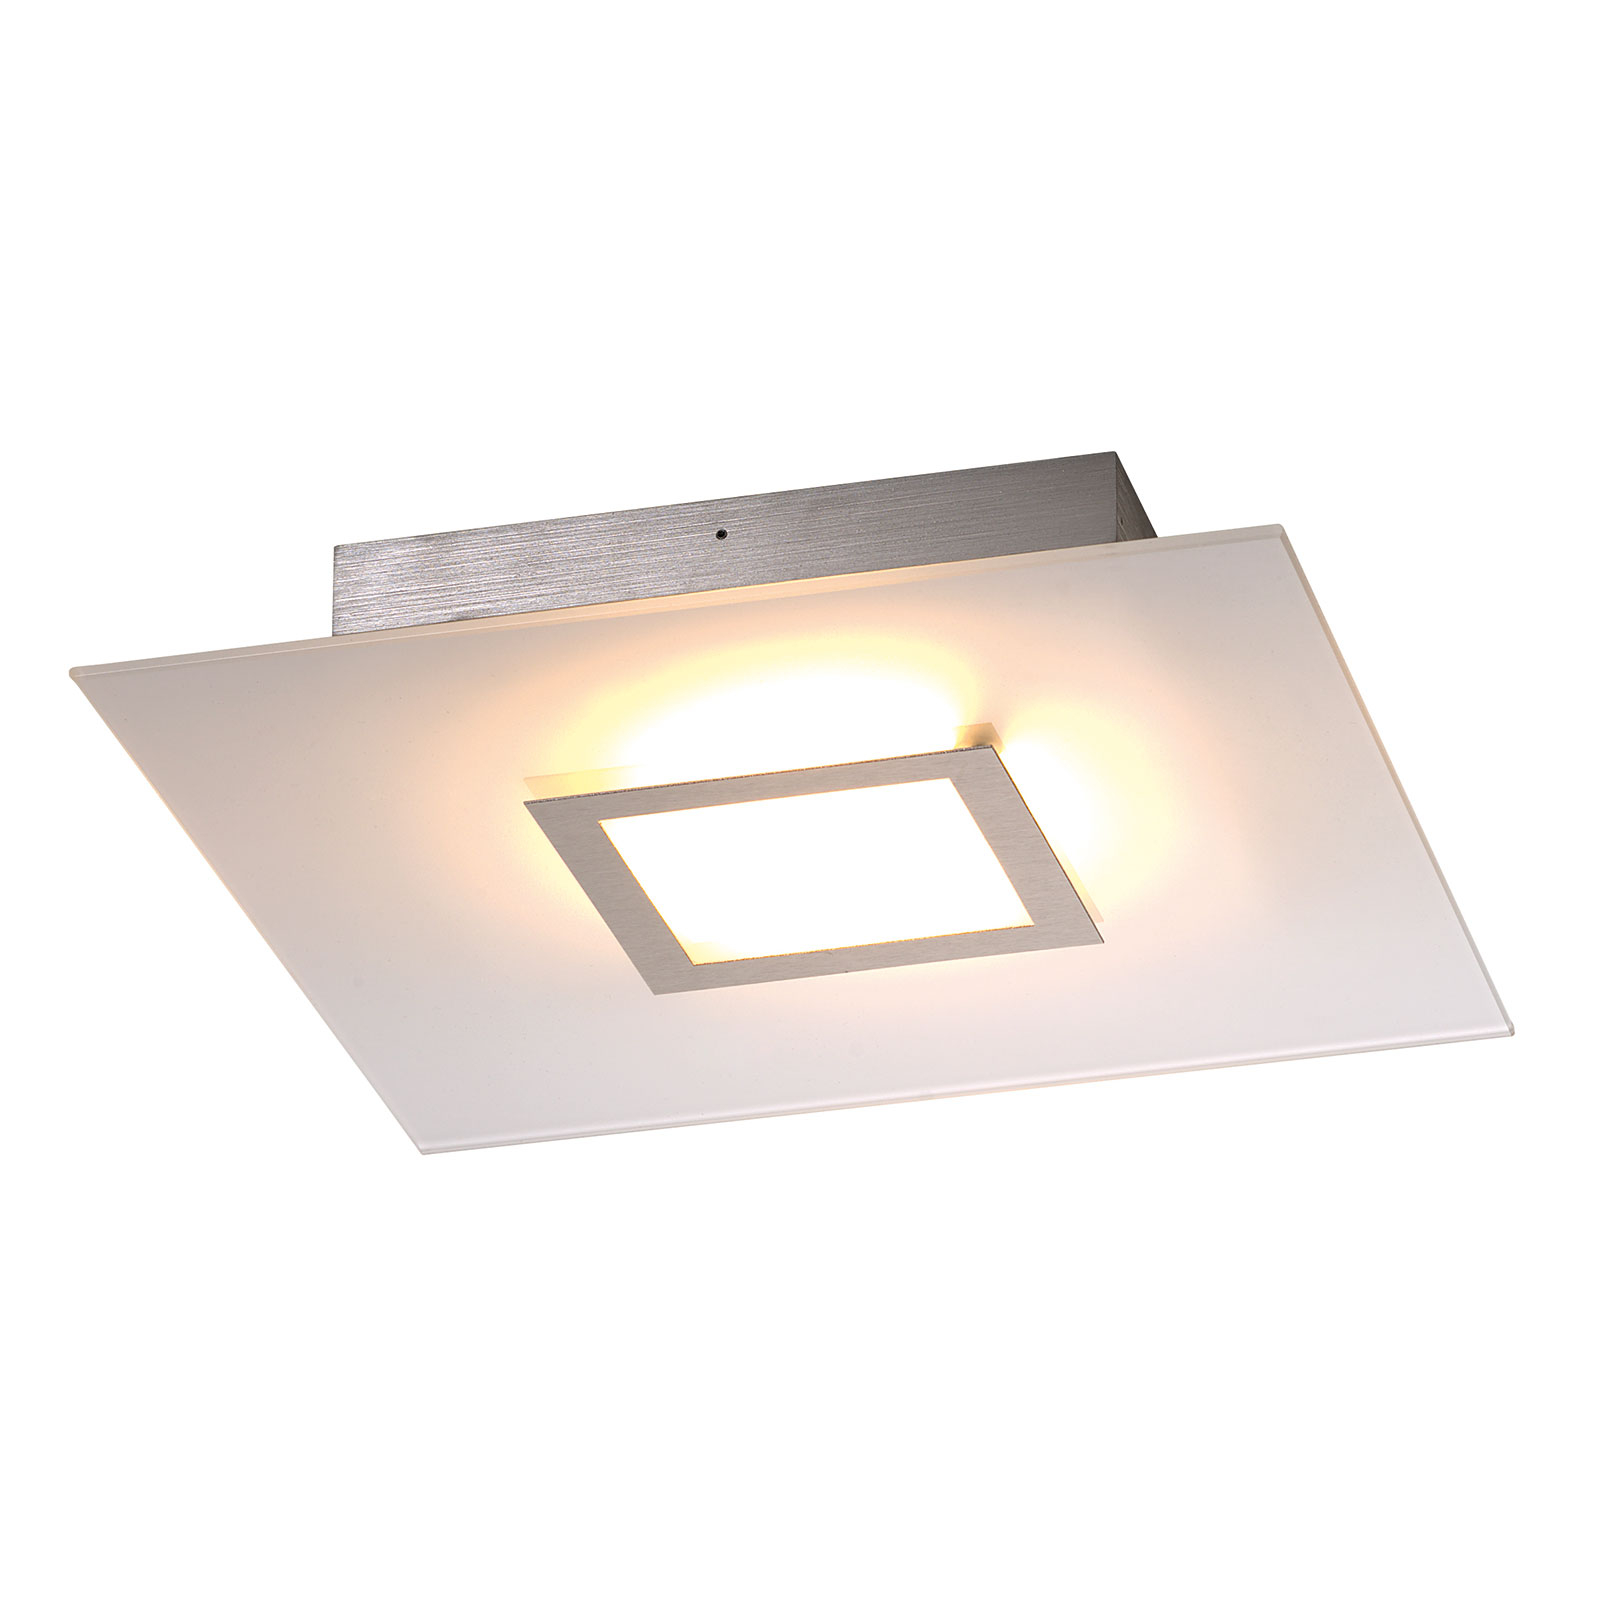 Flat - plafoniera LED quadrata, dimmerabile